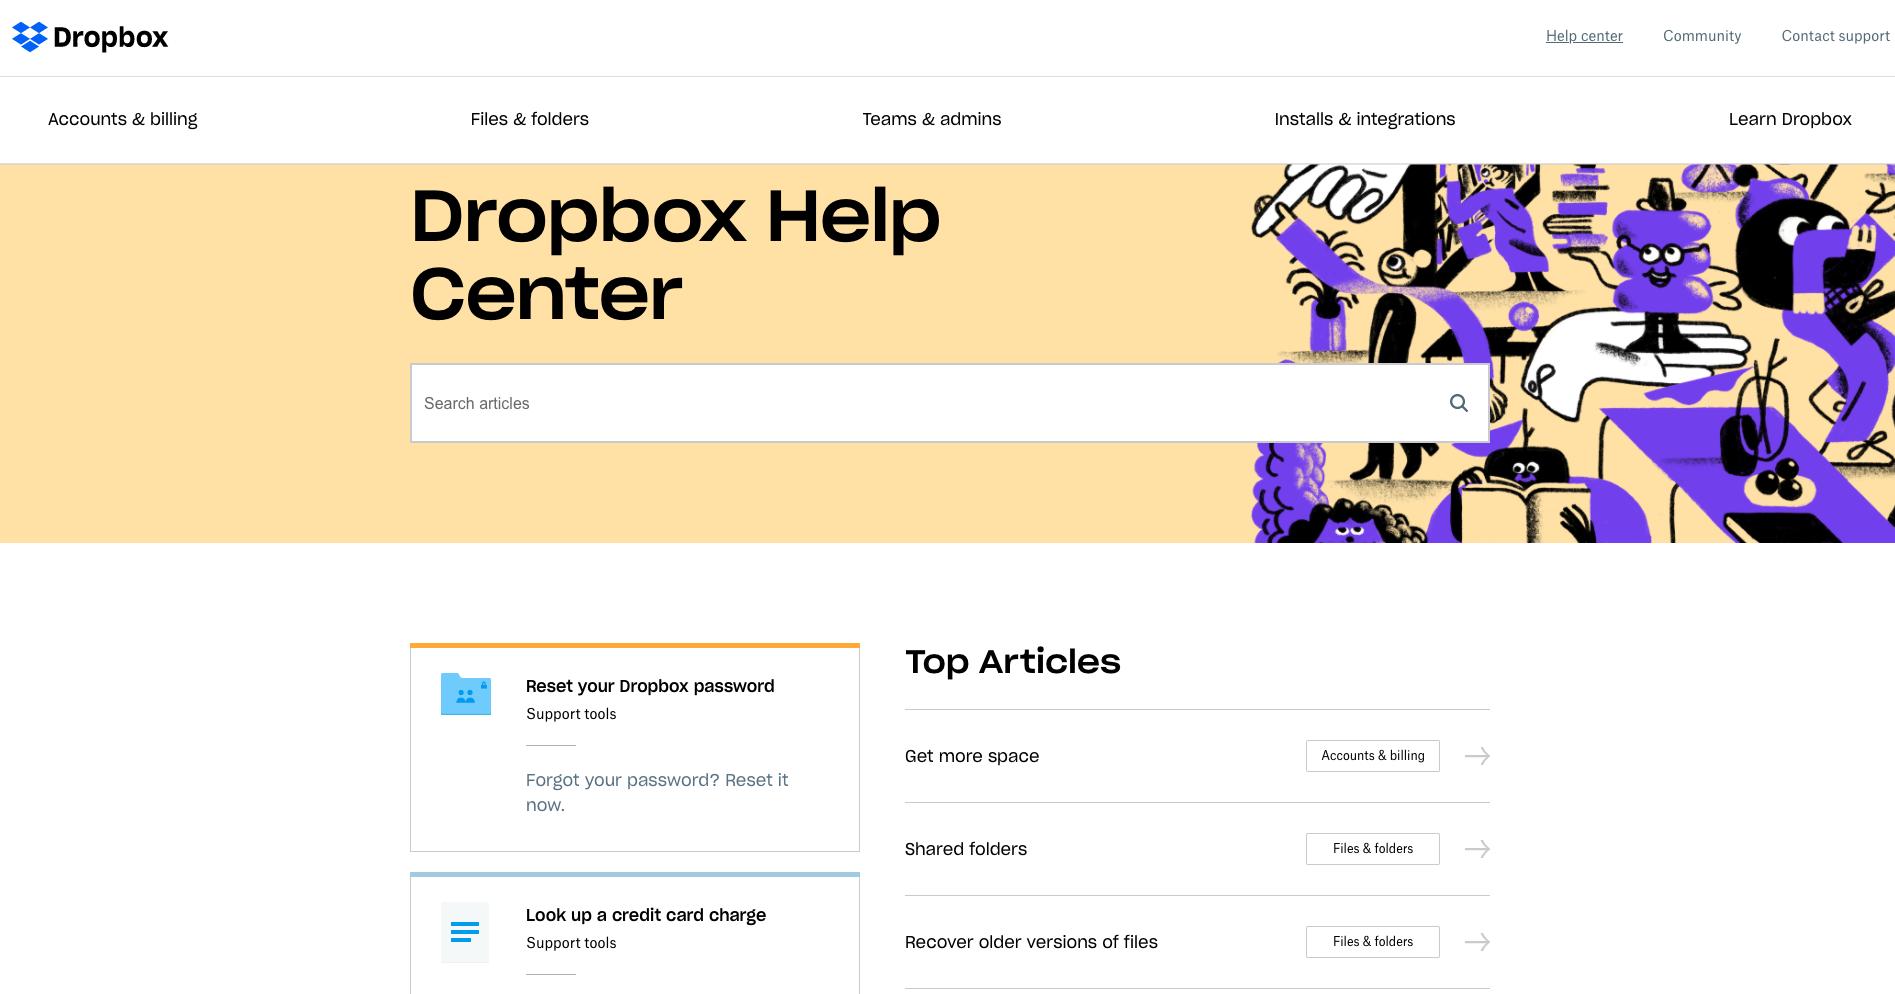 Dropbox FAQs page